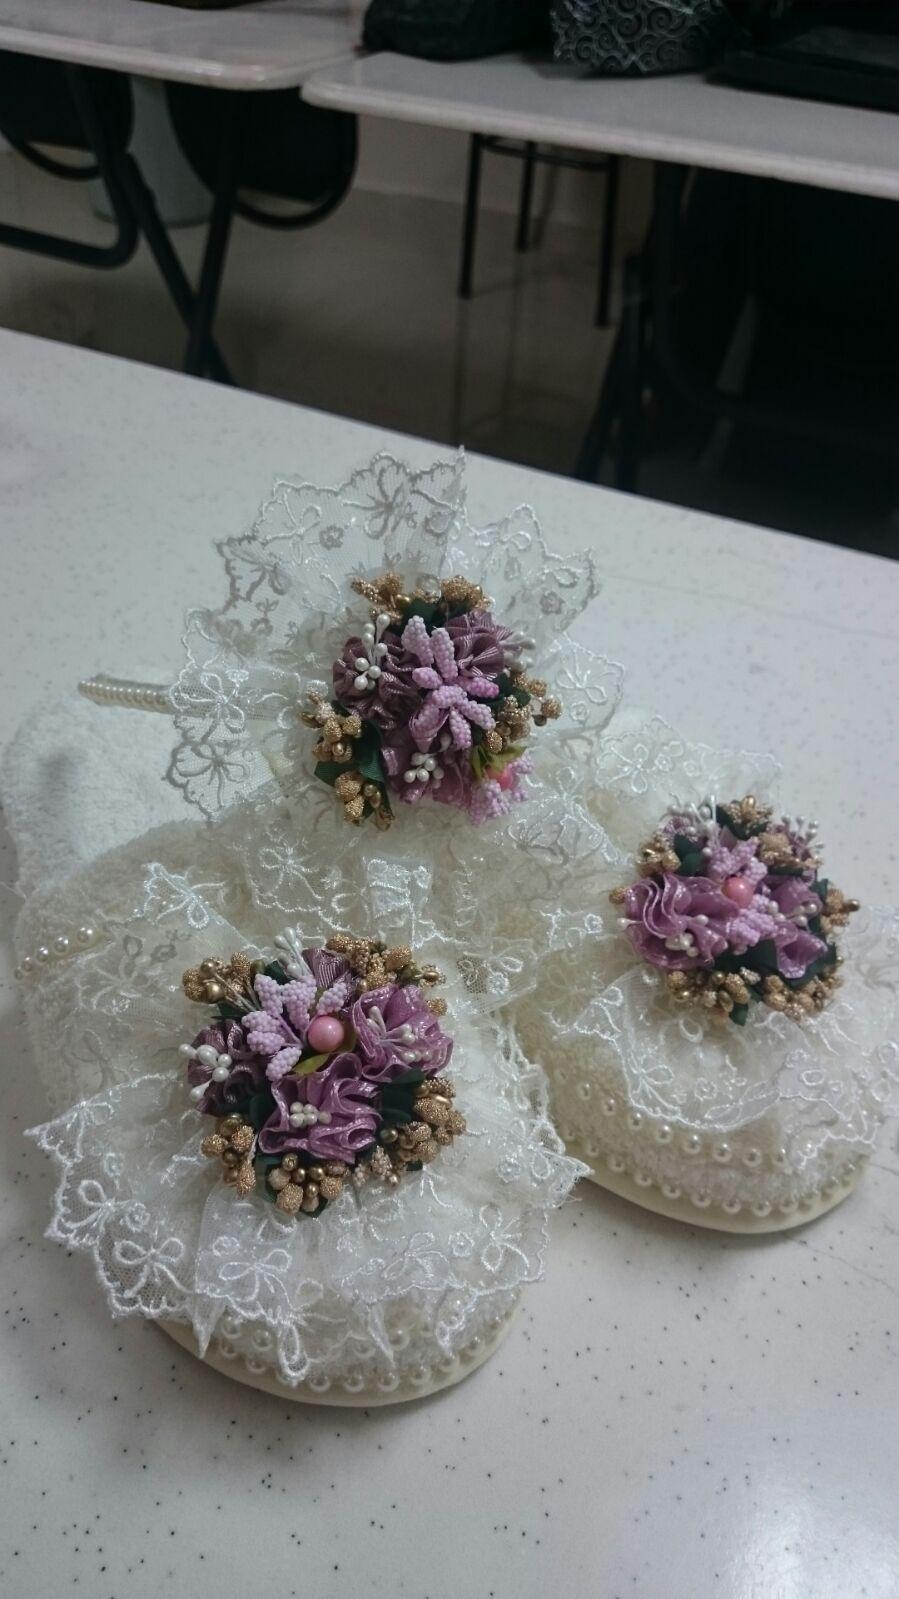 Pin by marianne fontaine on romantische zeepjes pinterest shabby